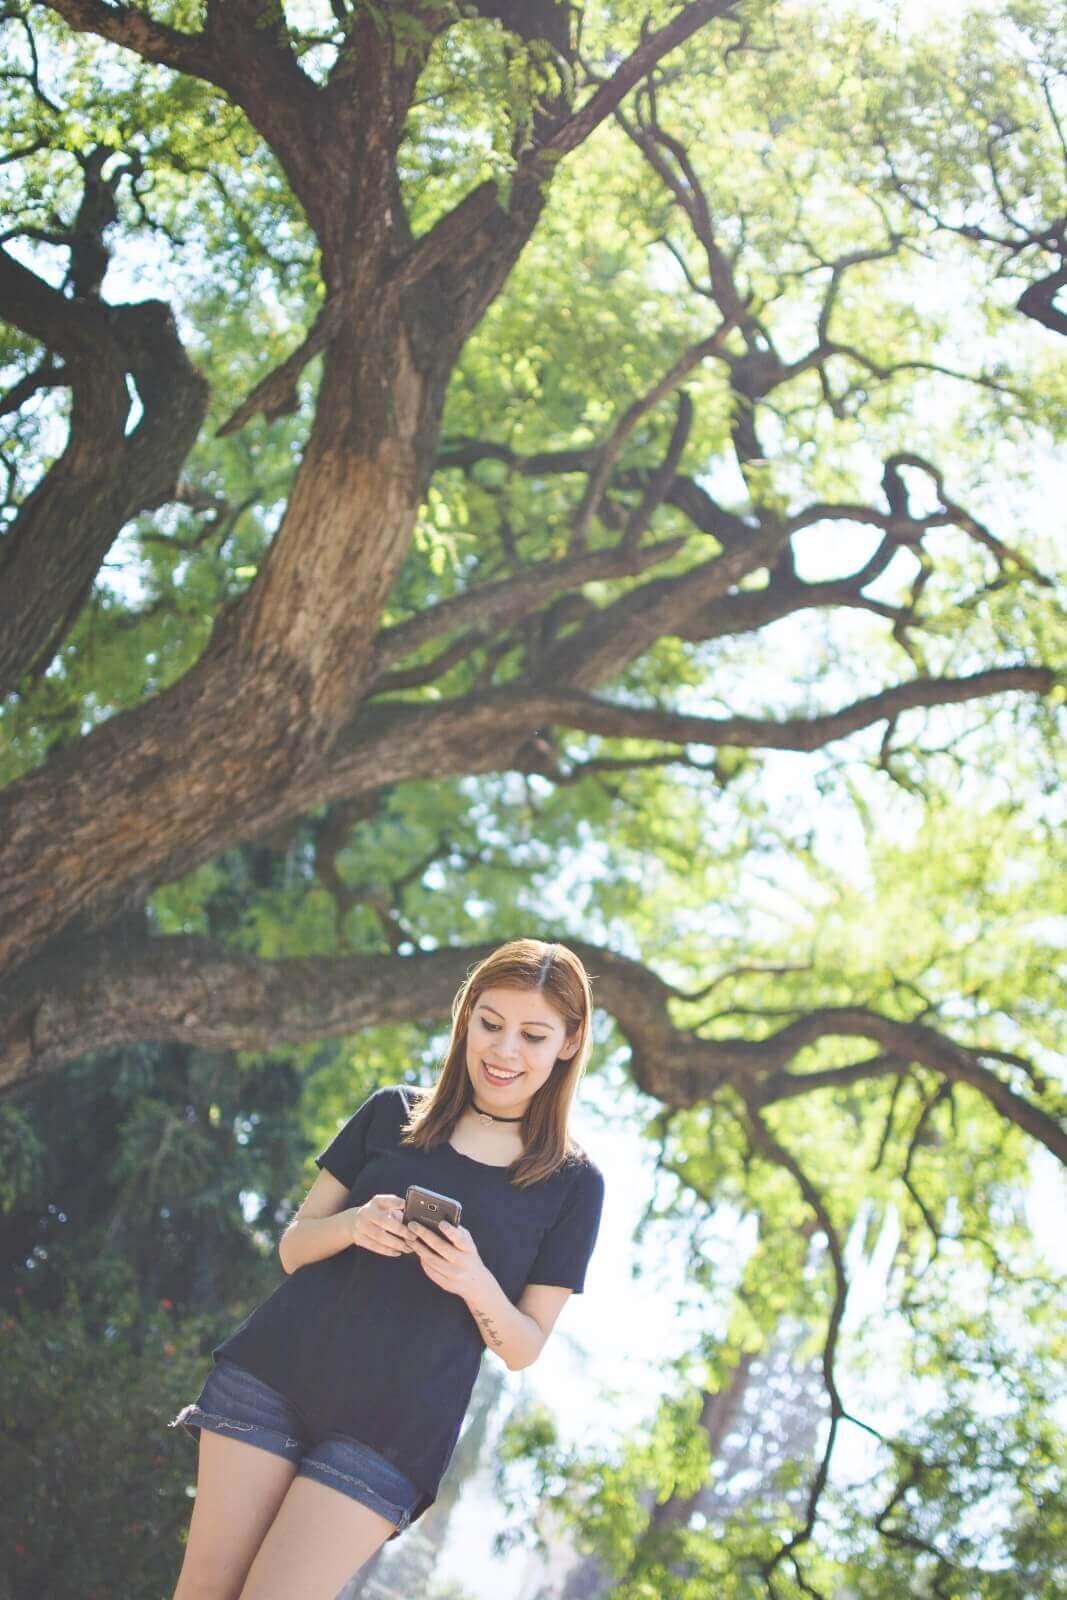 black-tshirt-jeans-california-girl-outfit-ankle-booties-summer-in-black-deborah-ferrero-style-by-deb06